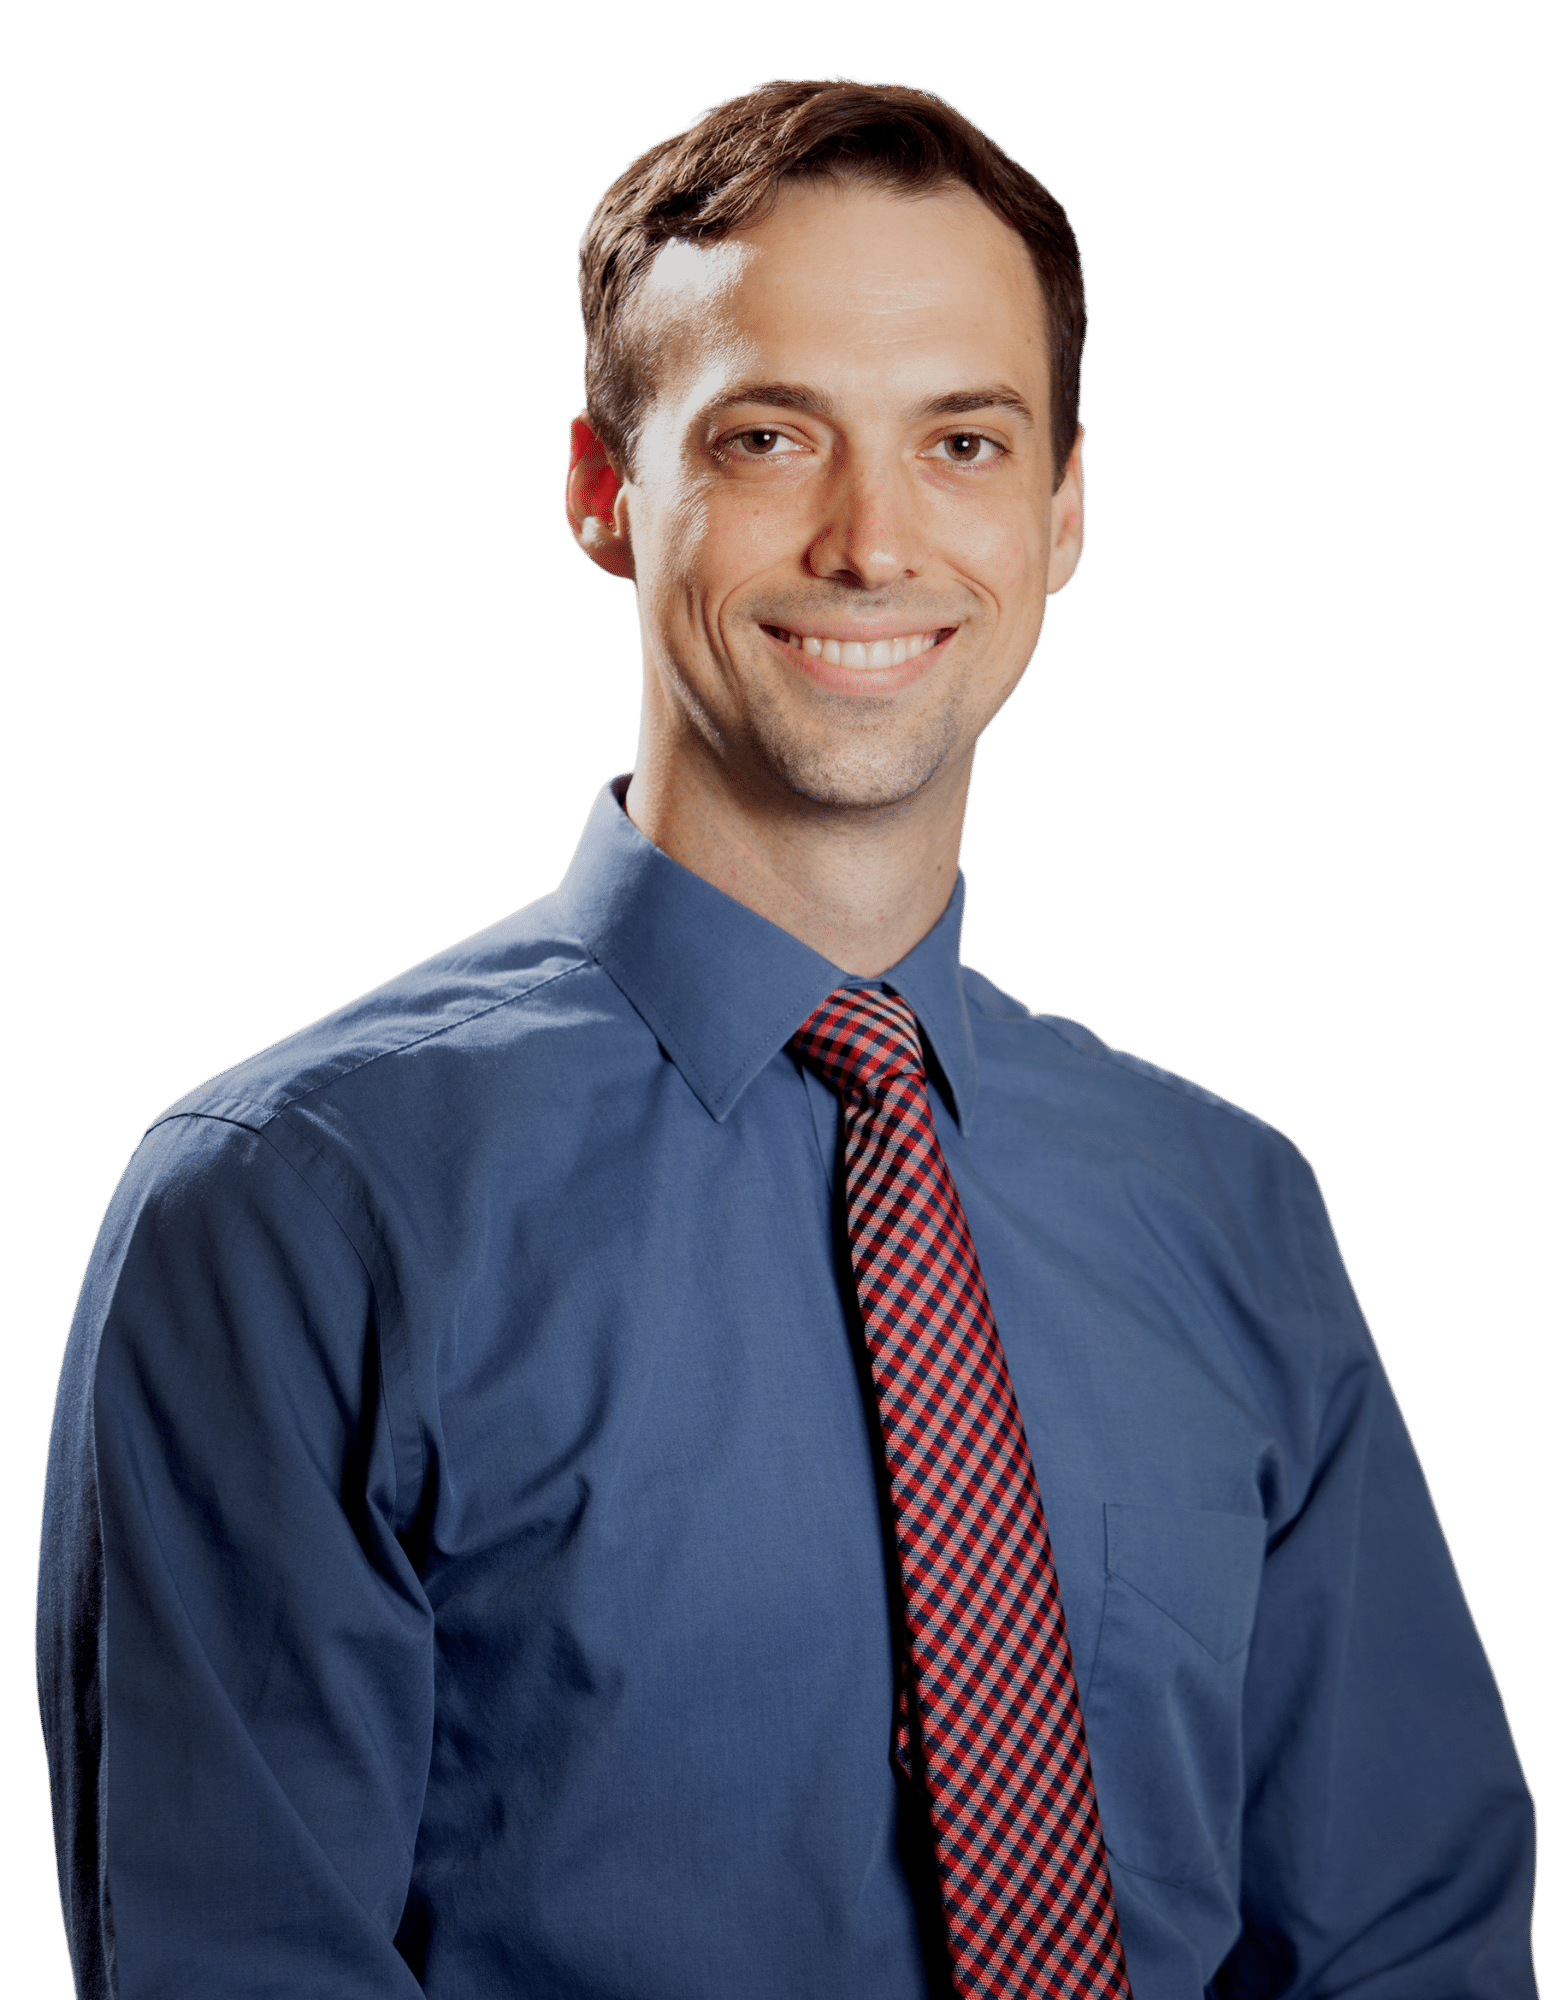 Collin Naugher a CPNP at Kid Care Pediatrics in Texas